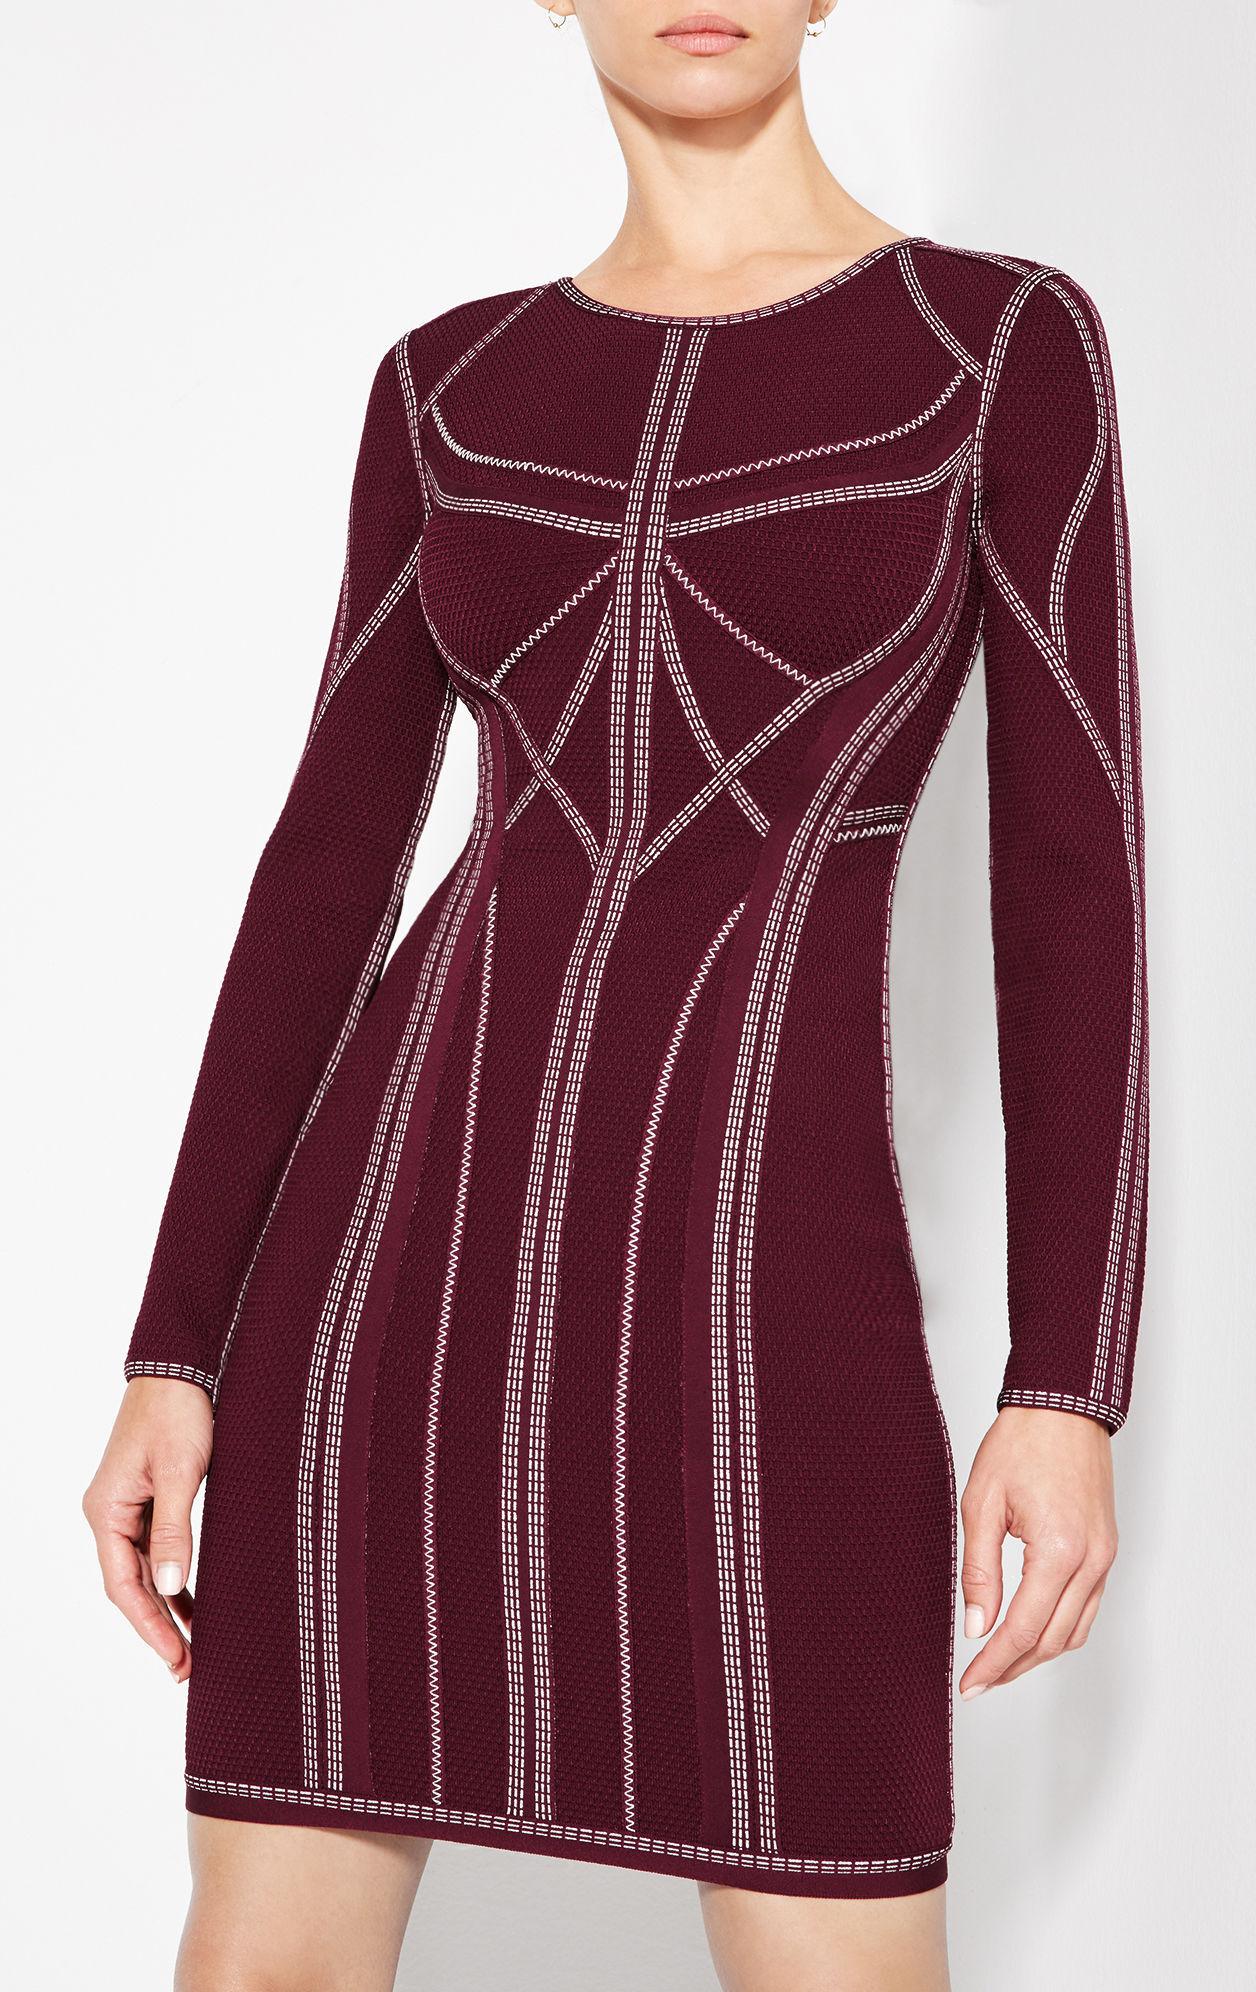 Elaina Metallic Stitch Dress